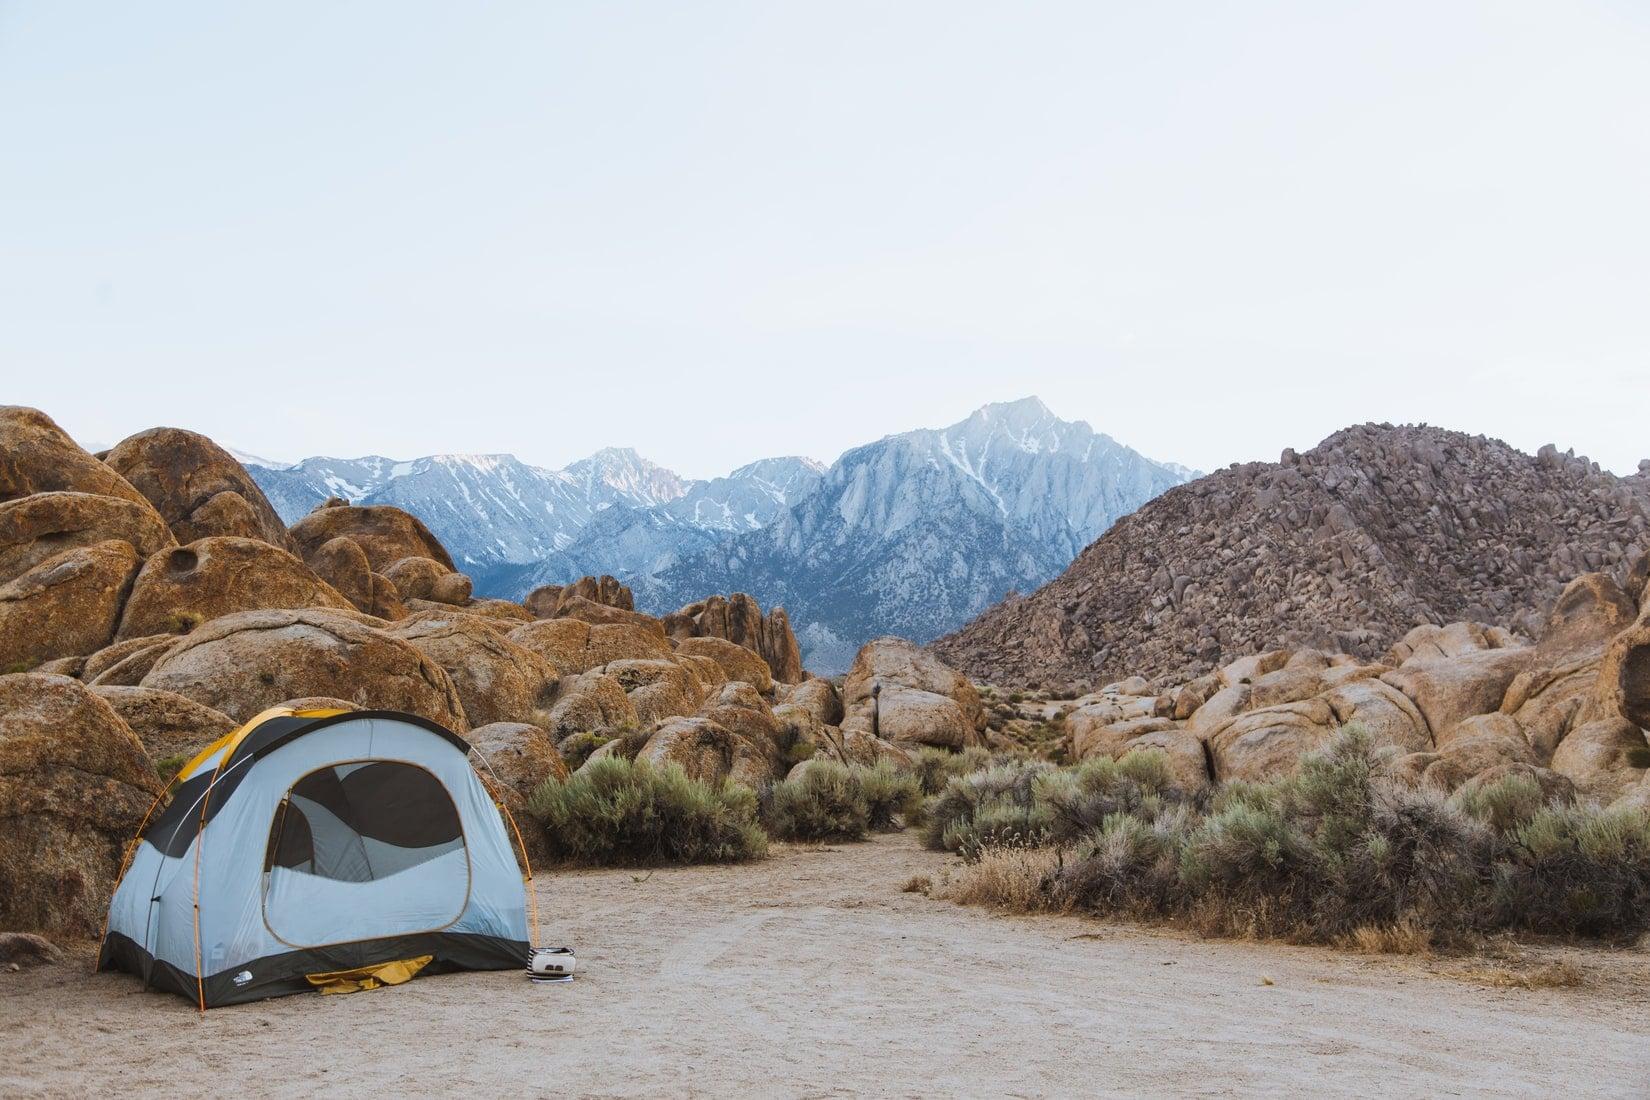 Alabama Hills, camping, california, Inyo County